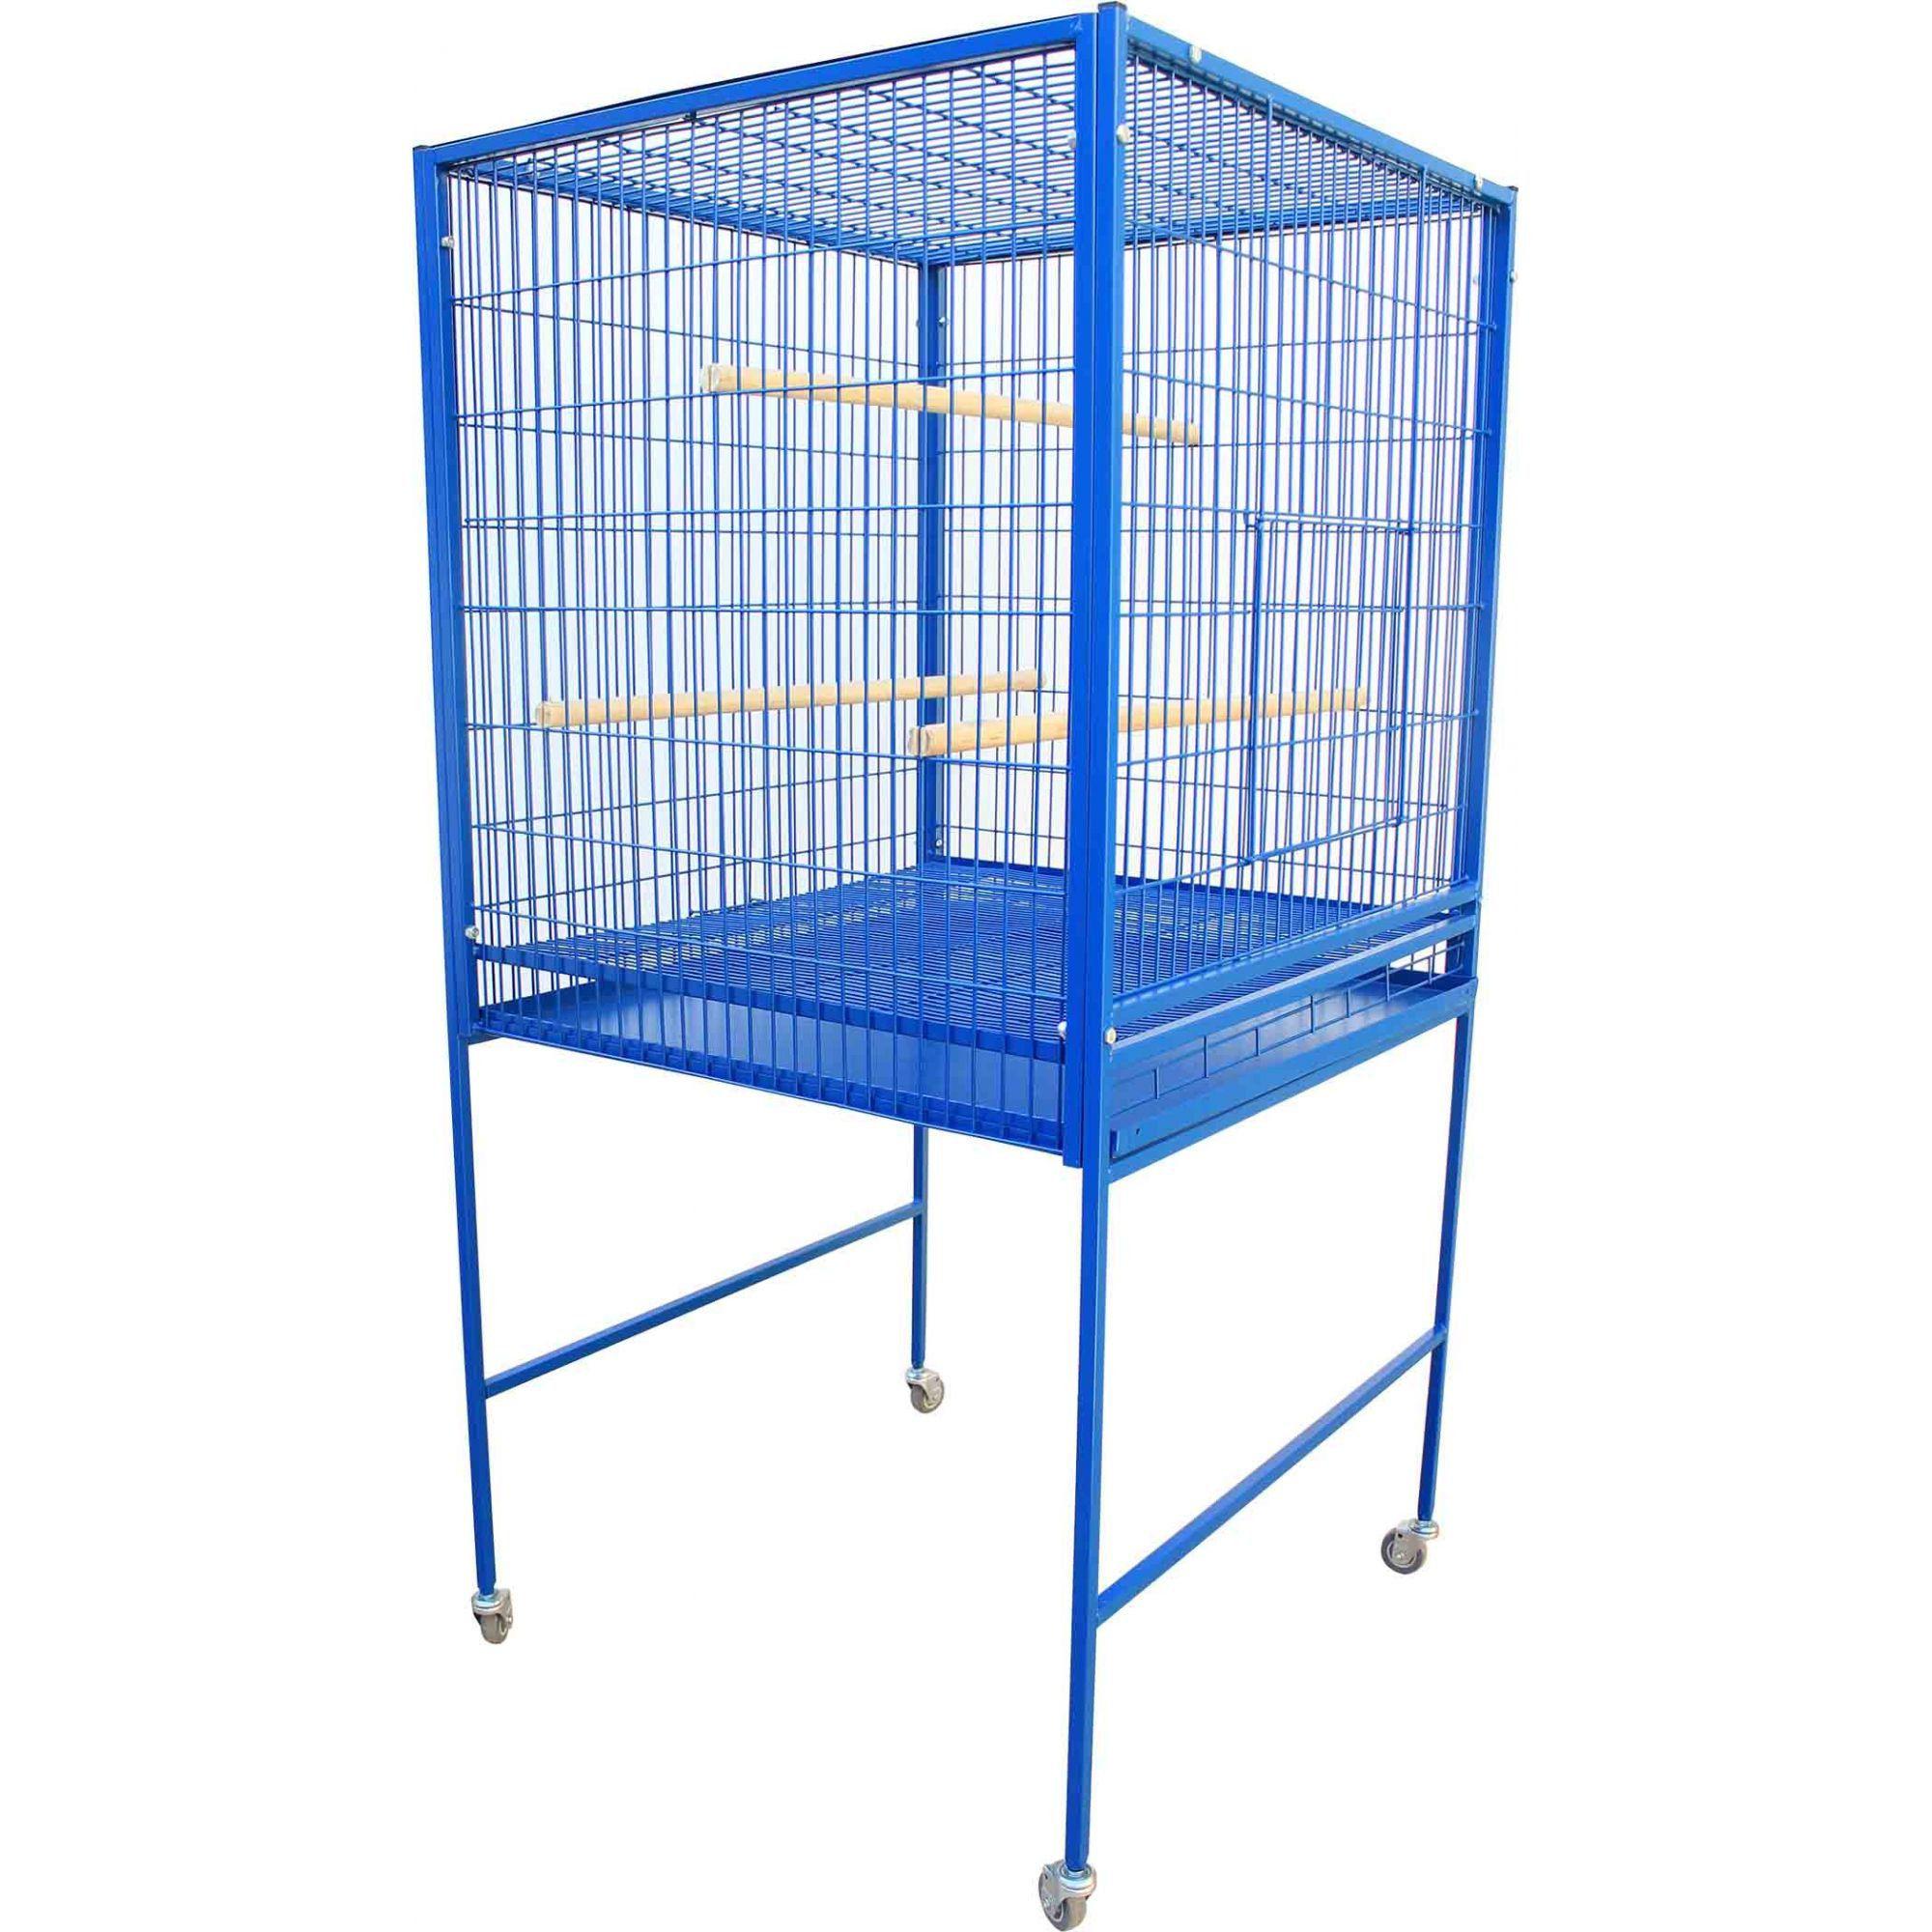 Gaiola Ring Neck, Rosela, Arara, Papagaio, Cacatua - Azul